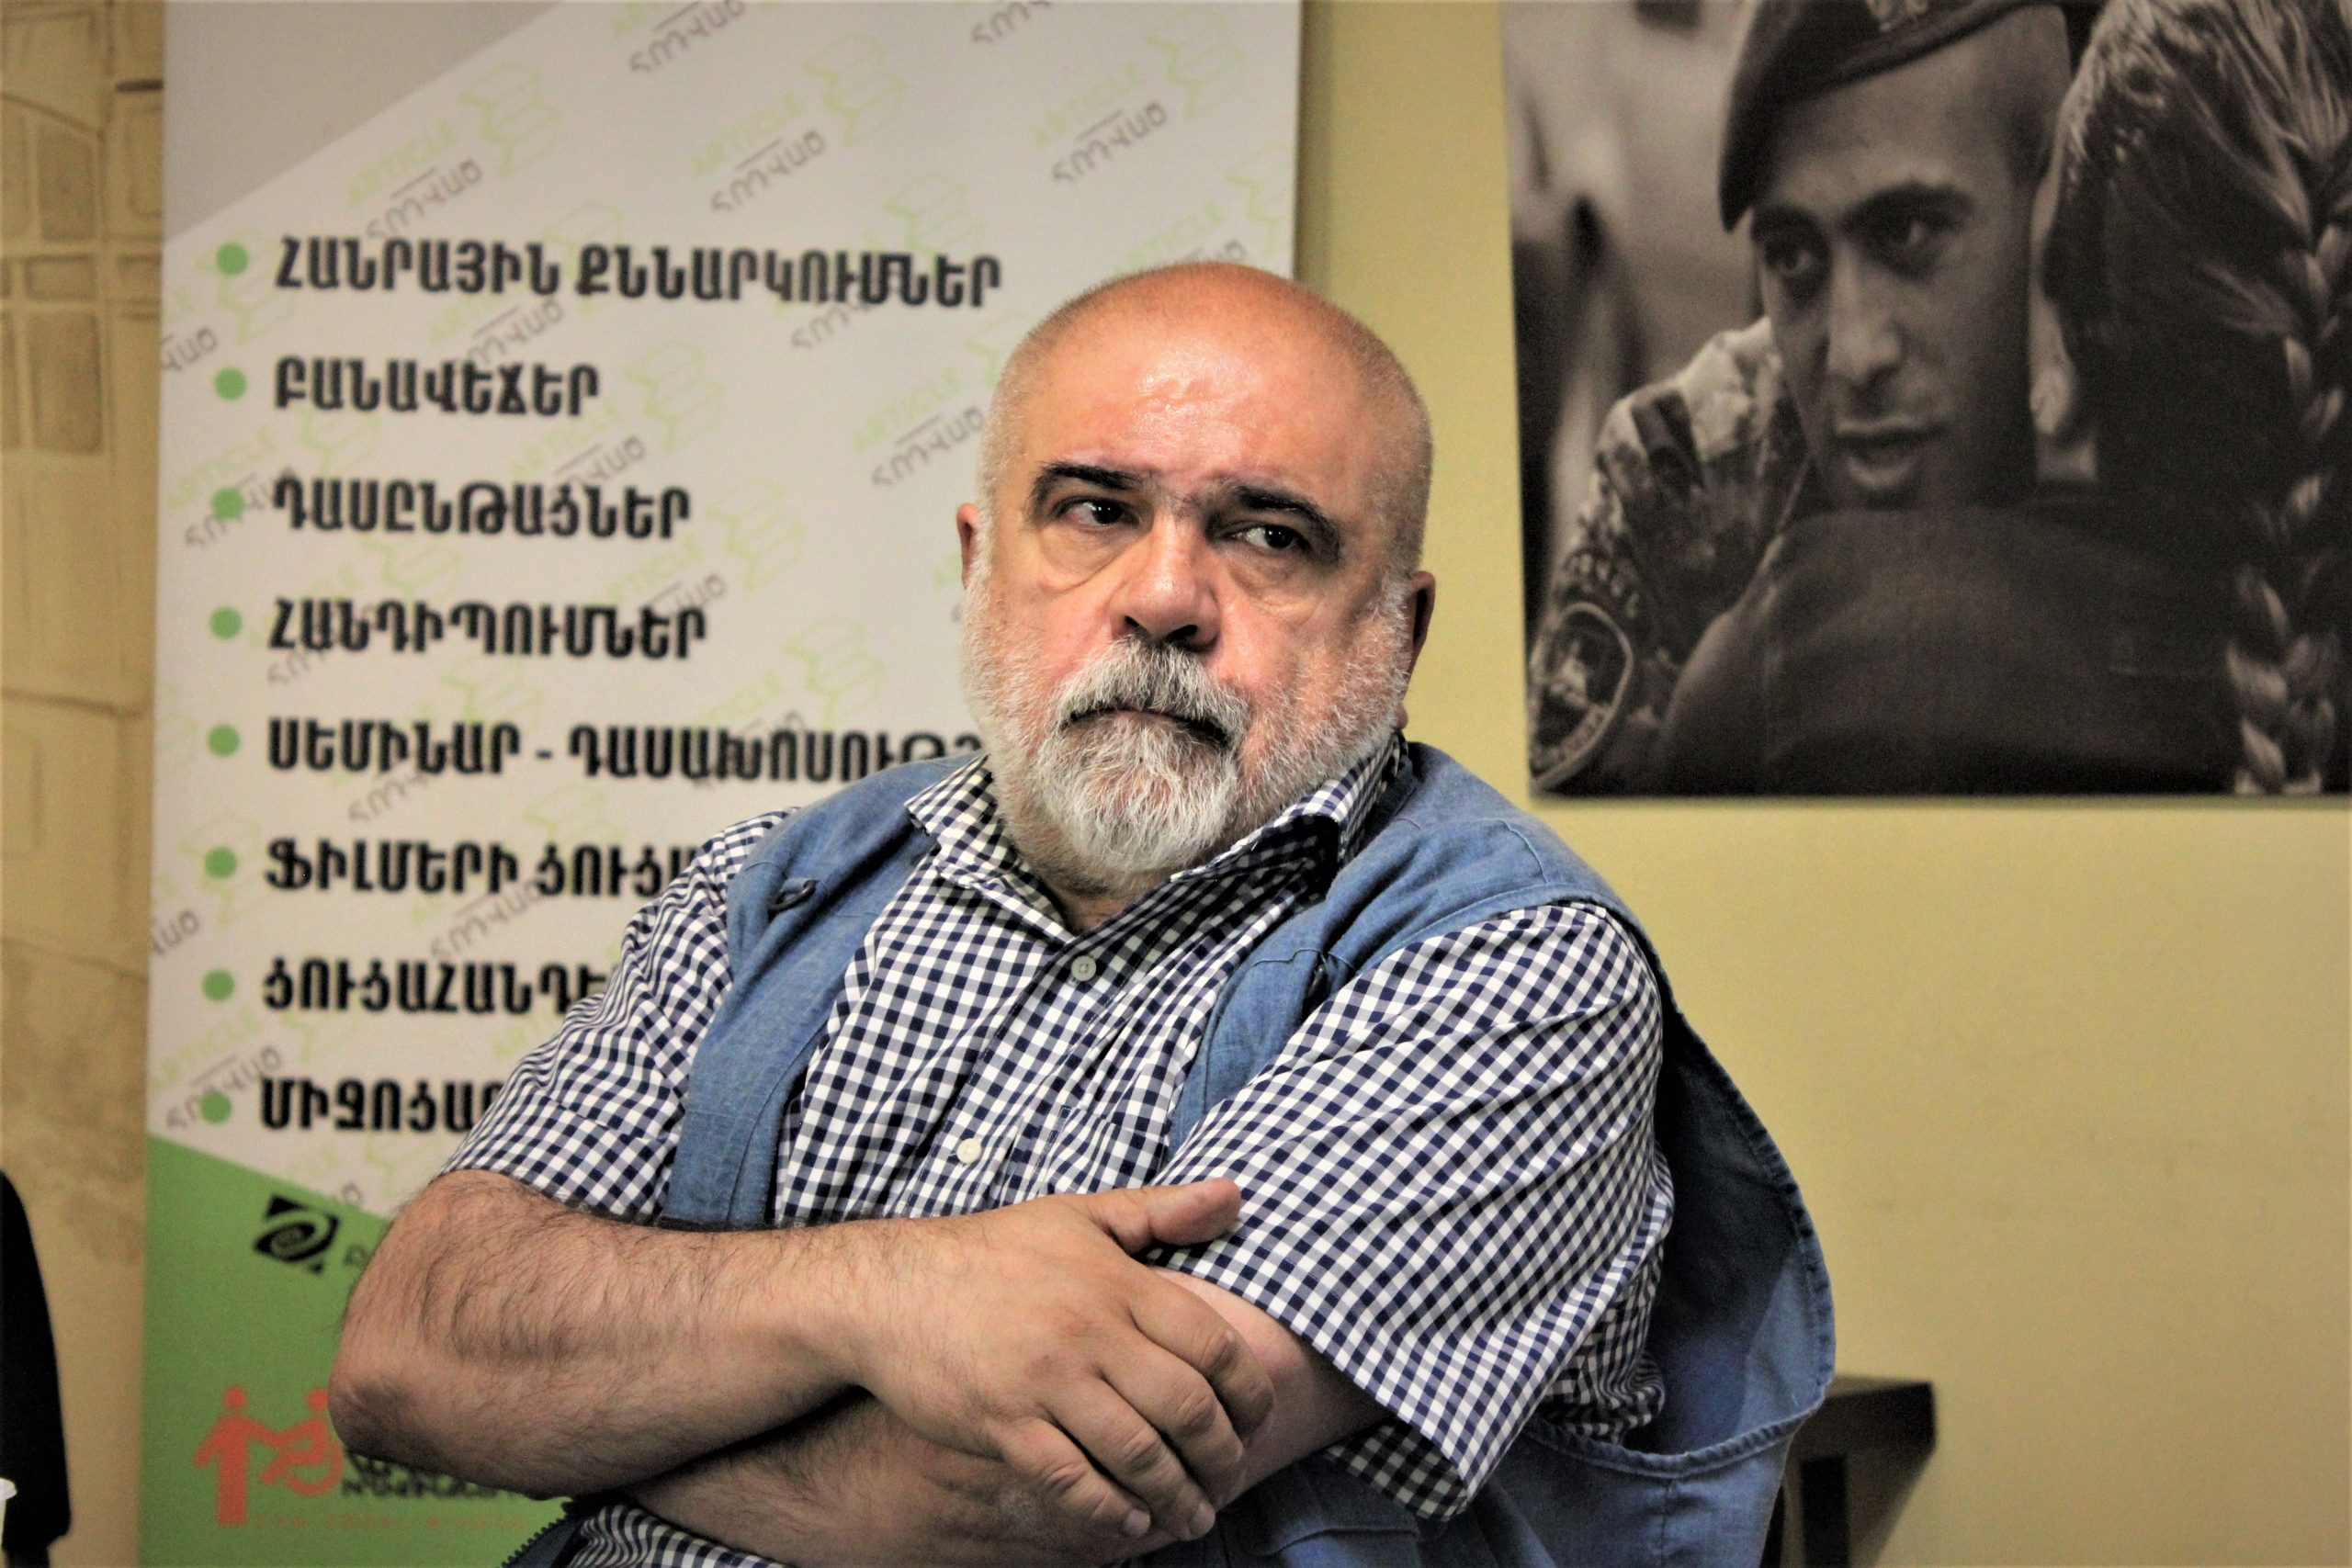 Alexander Iskandaryan scaled #интервью featured, Александр Искандарян, карабахская война, Нагорный Карабах, Никол Пашинян, Турция